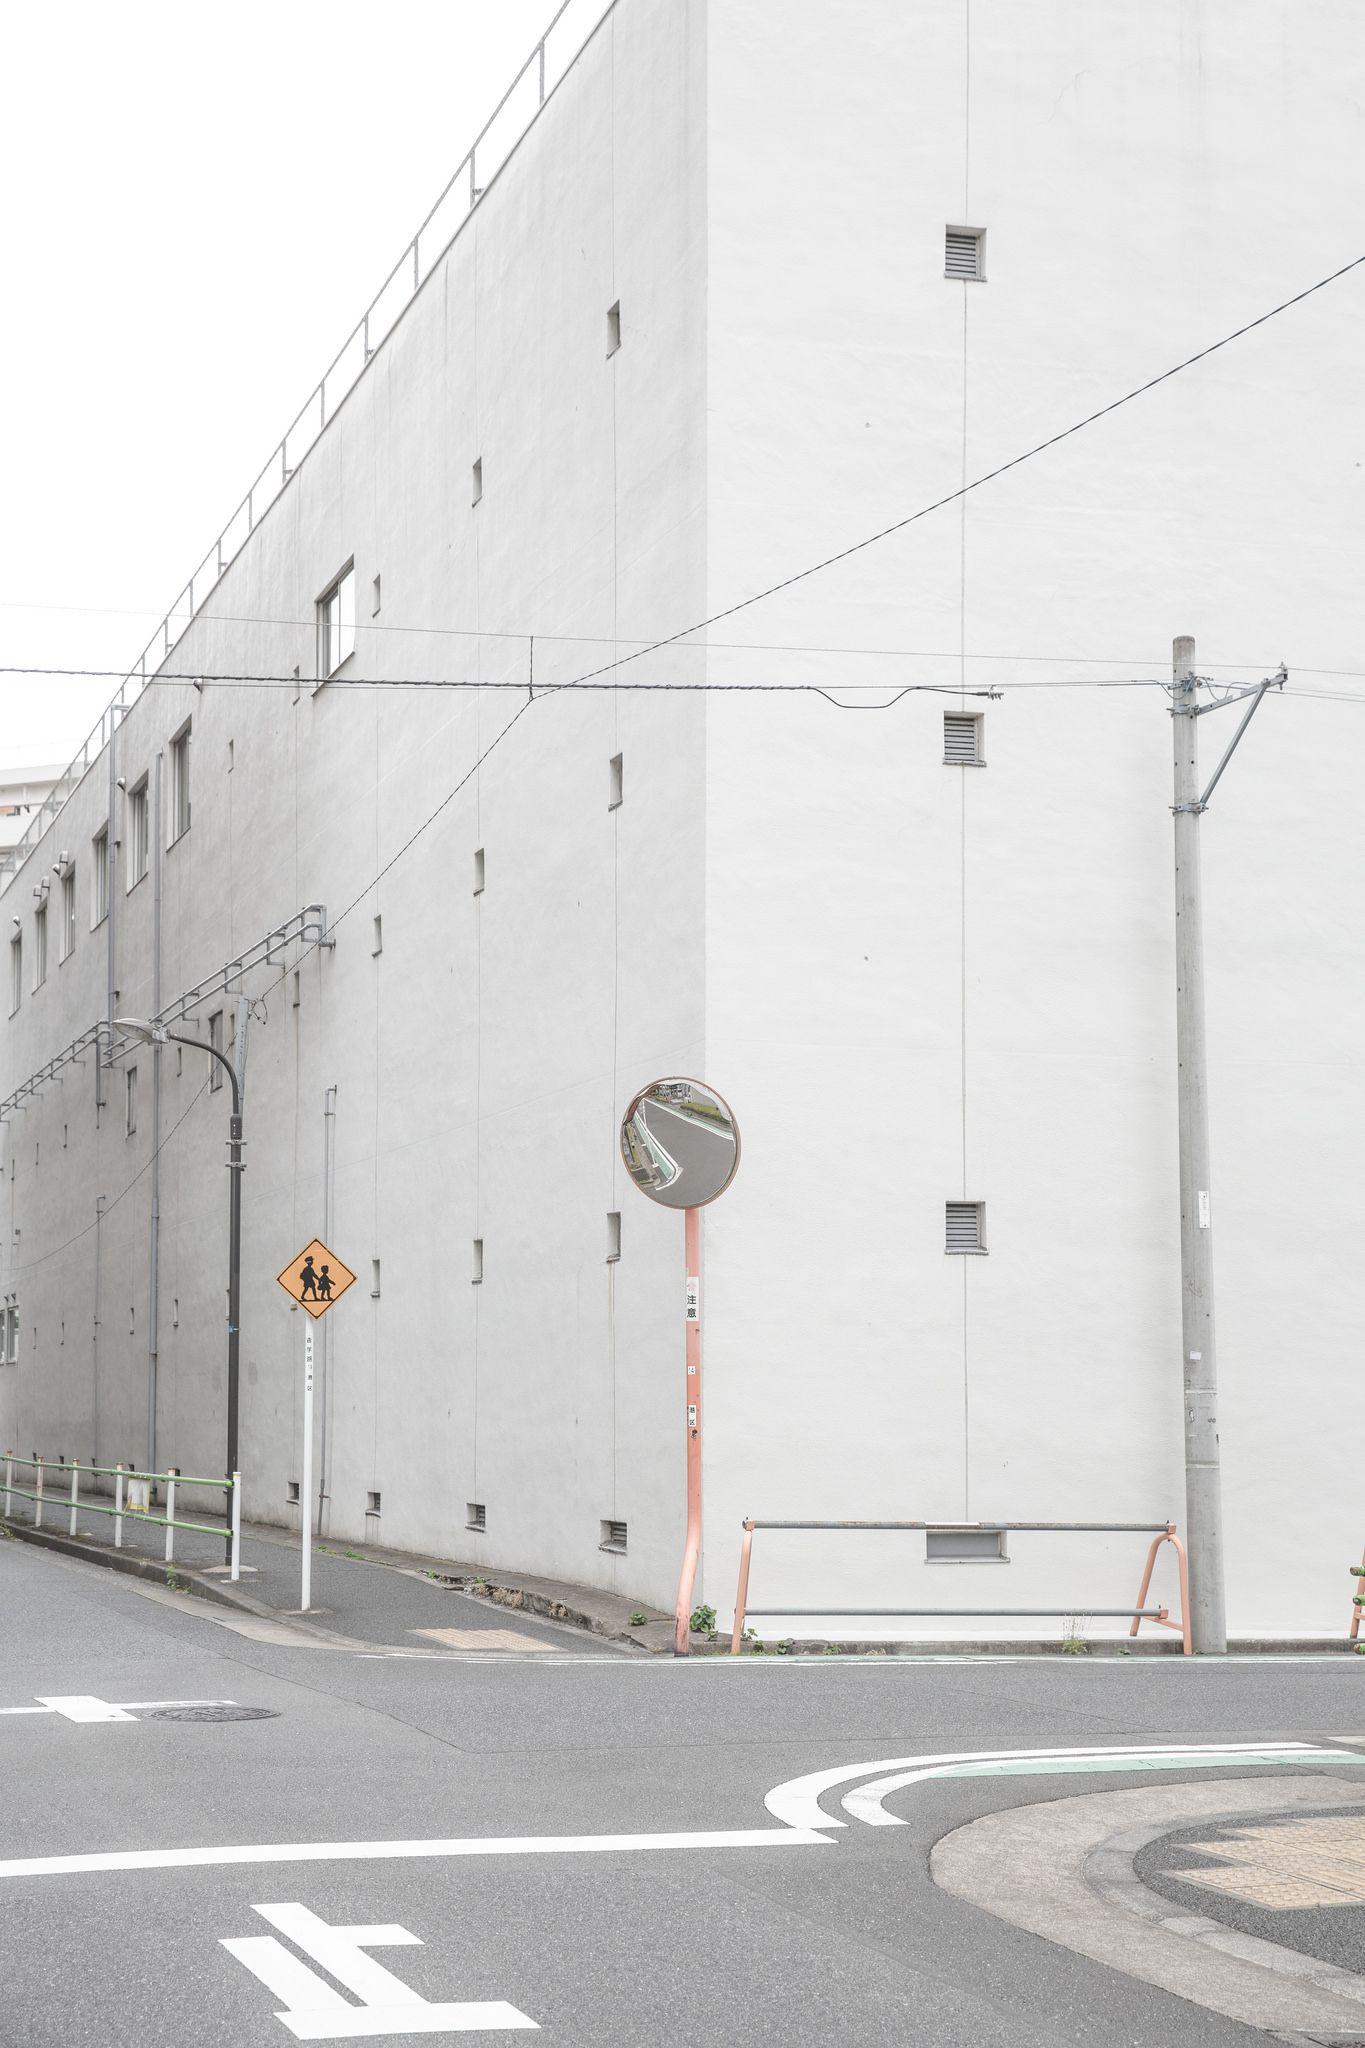 Street Tokyo 3 Minimalist Photography Scenery Wallpaper Minimal Wallpaper